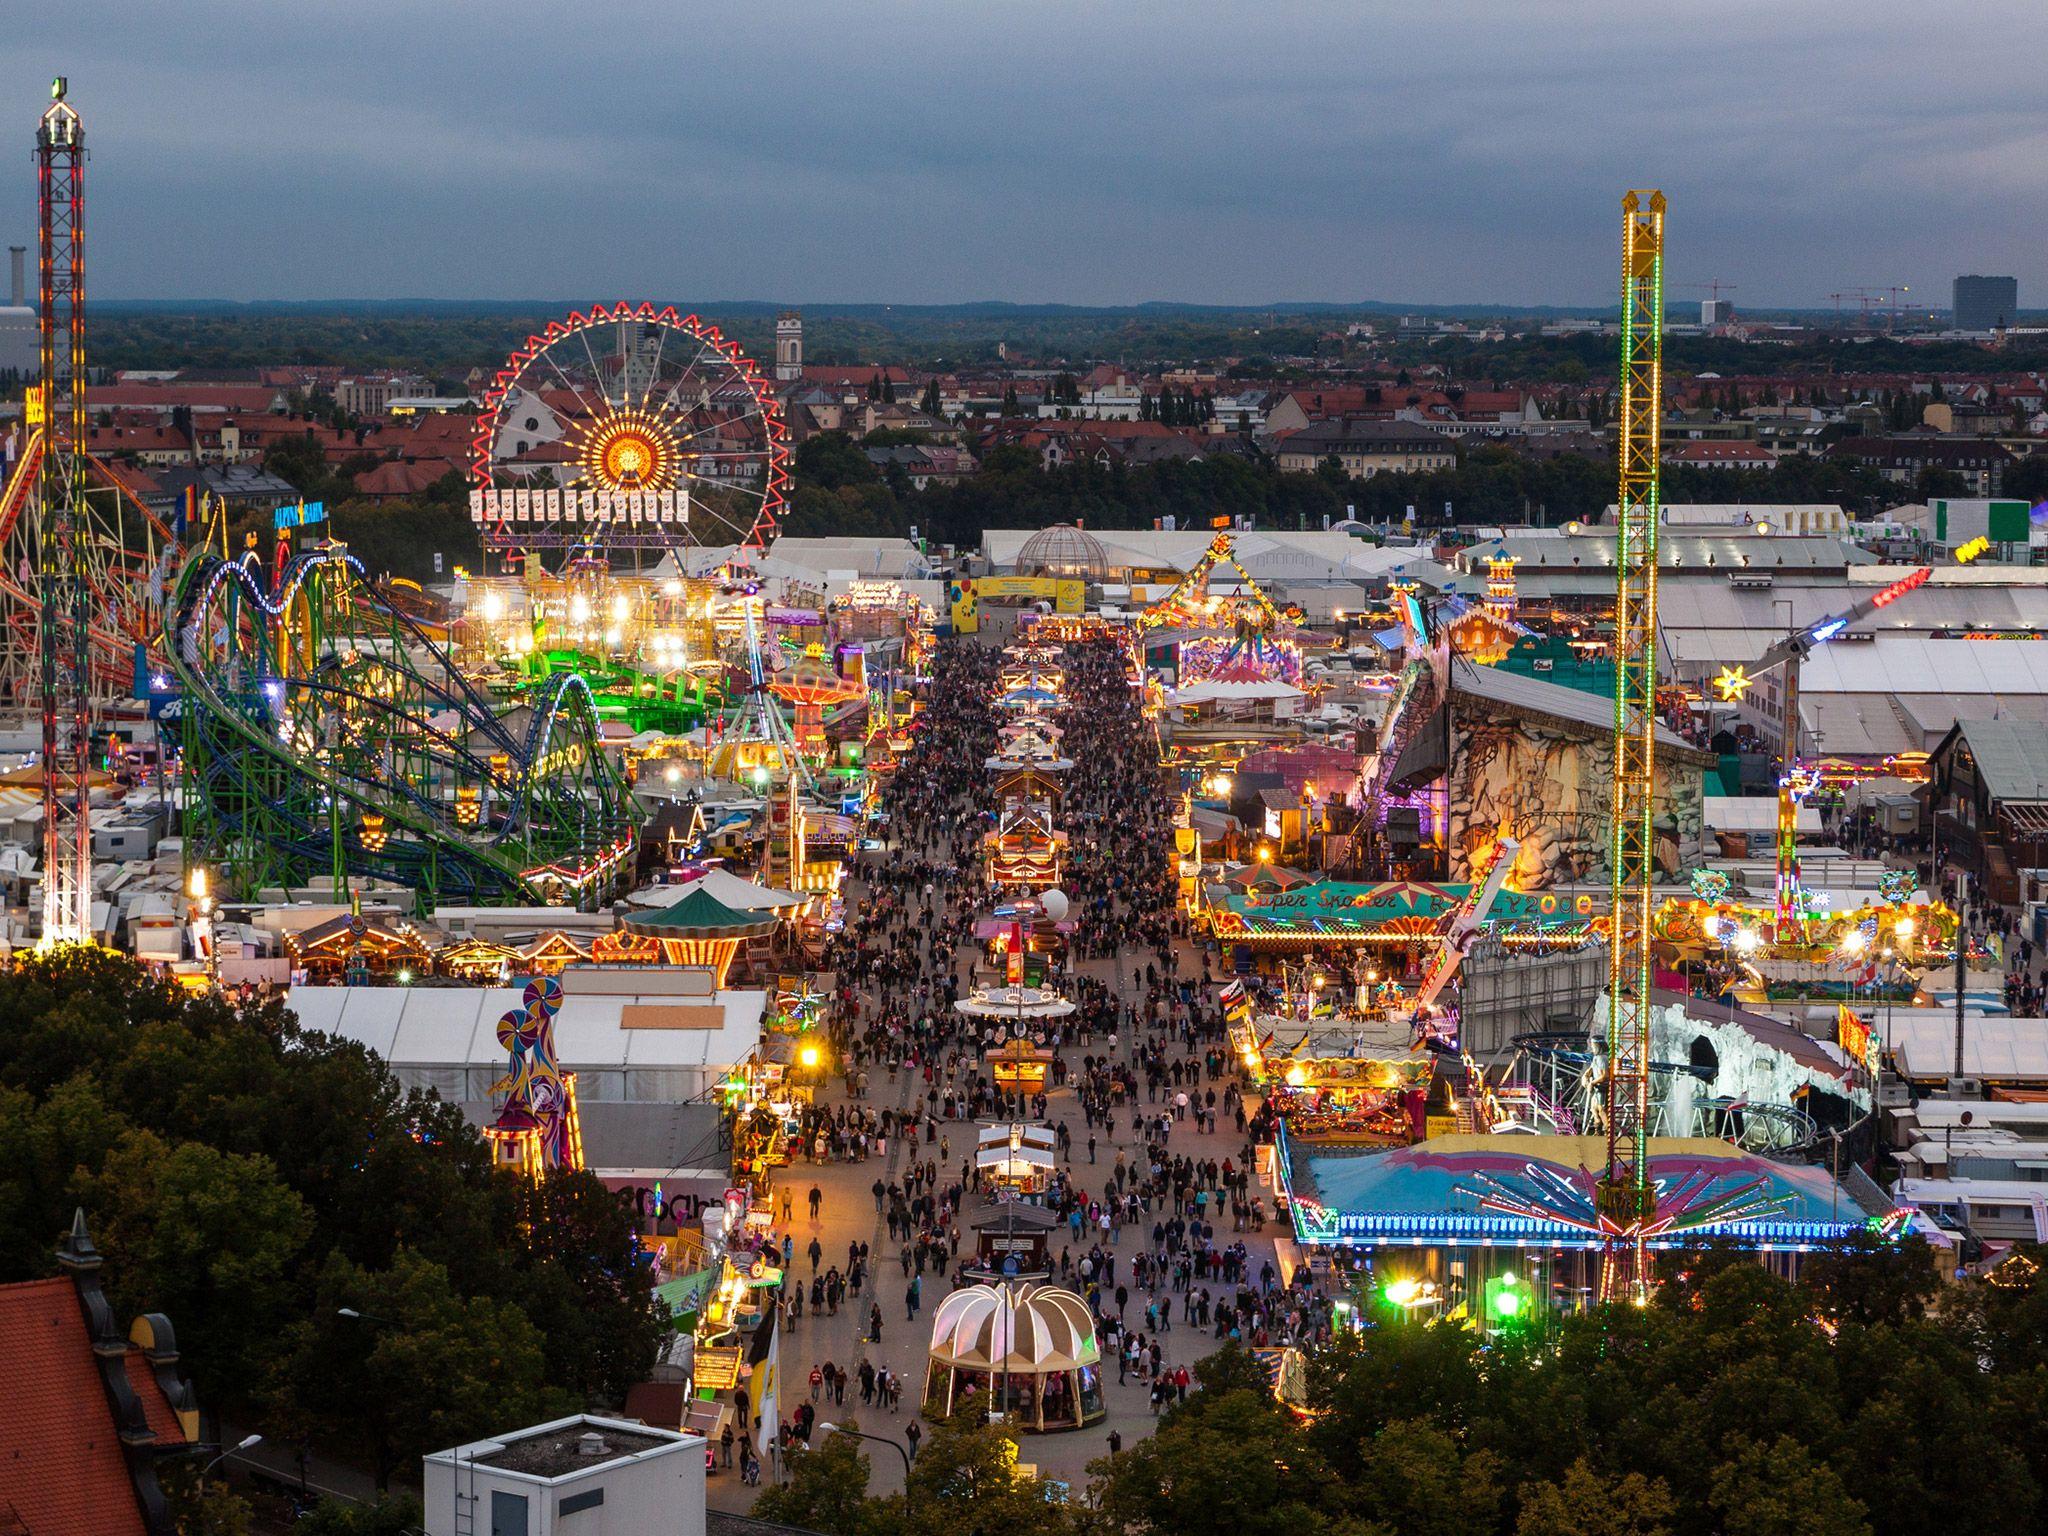 Oktoberfest Hotel Le Meridien Munich Theresienwiese - آشنایی با جشن های بین المللی دنیا